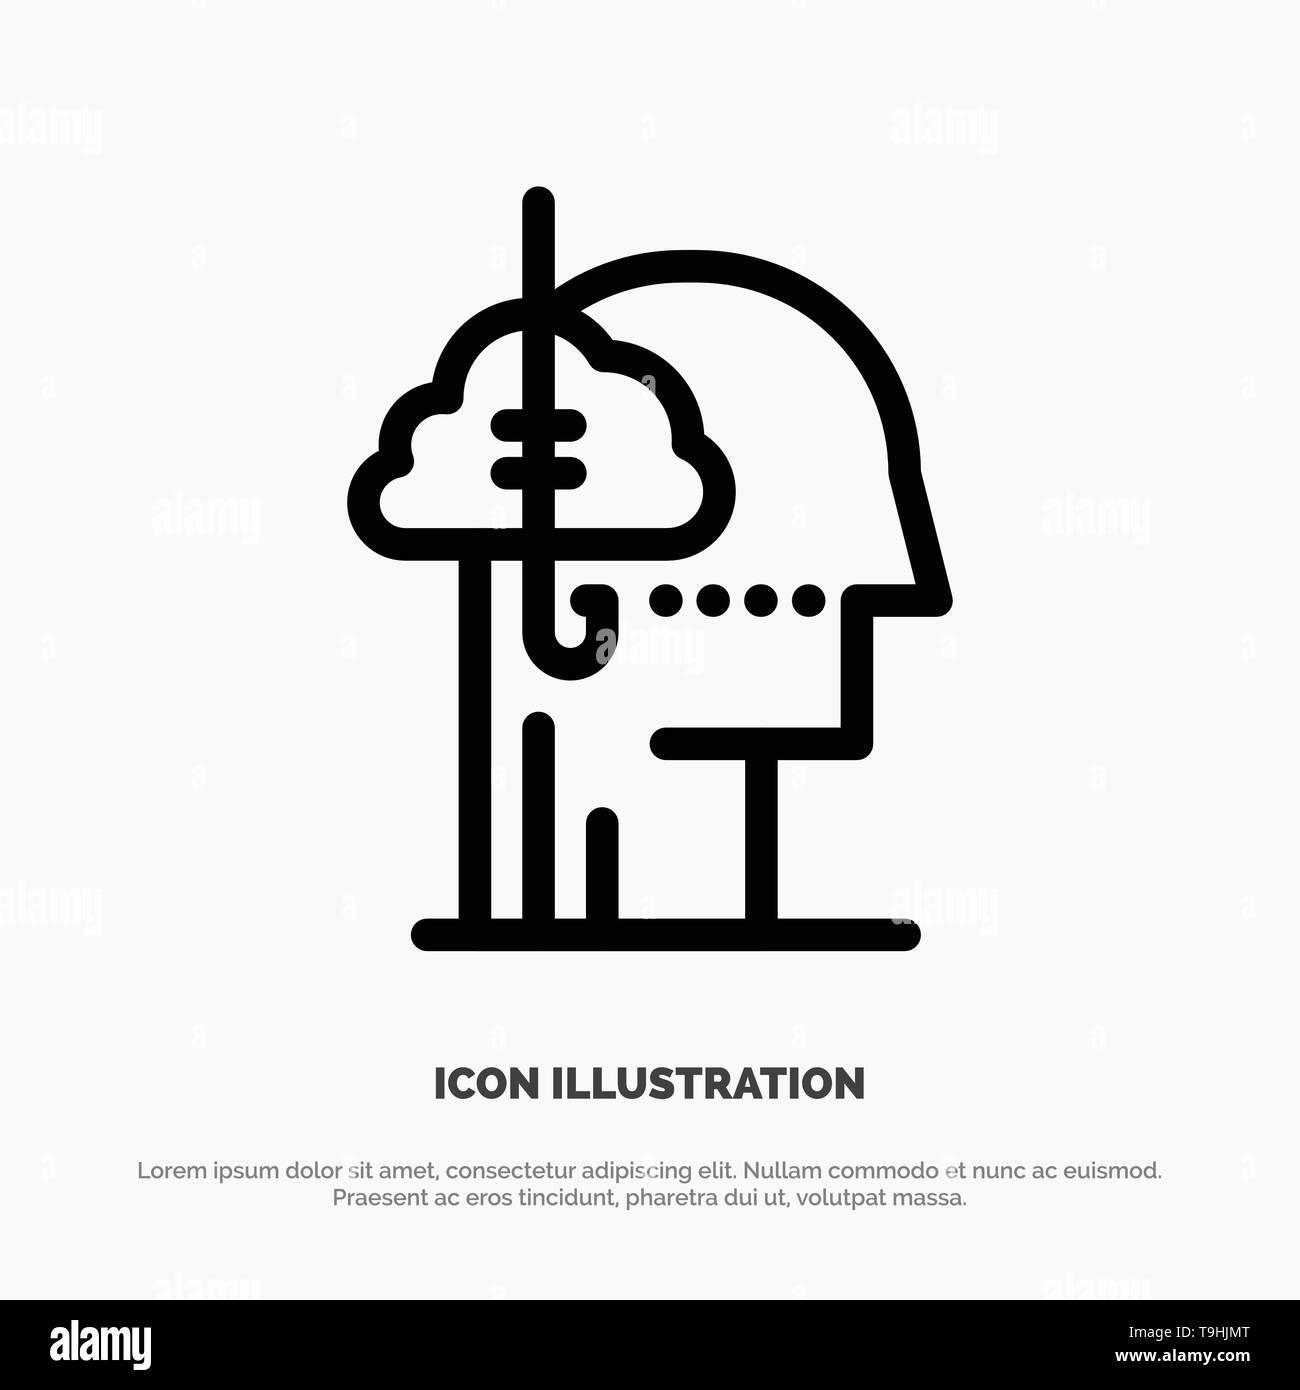 Borrowing Ideas, Addiction, Catch, Habit, Human Line Icon Vector - Stock Image